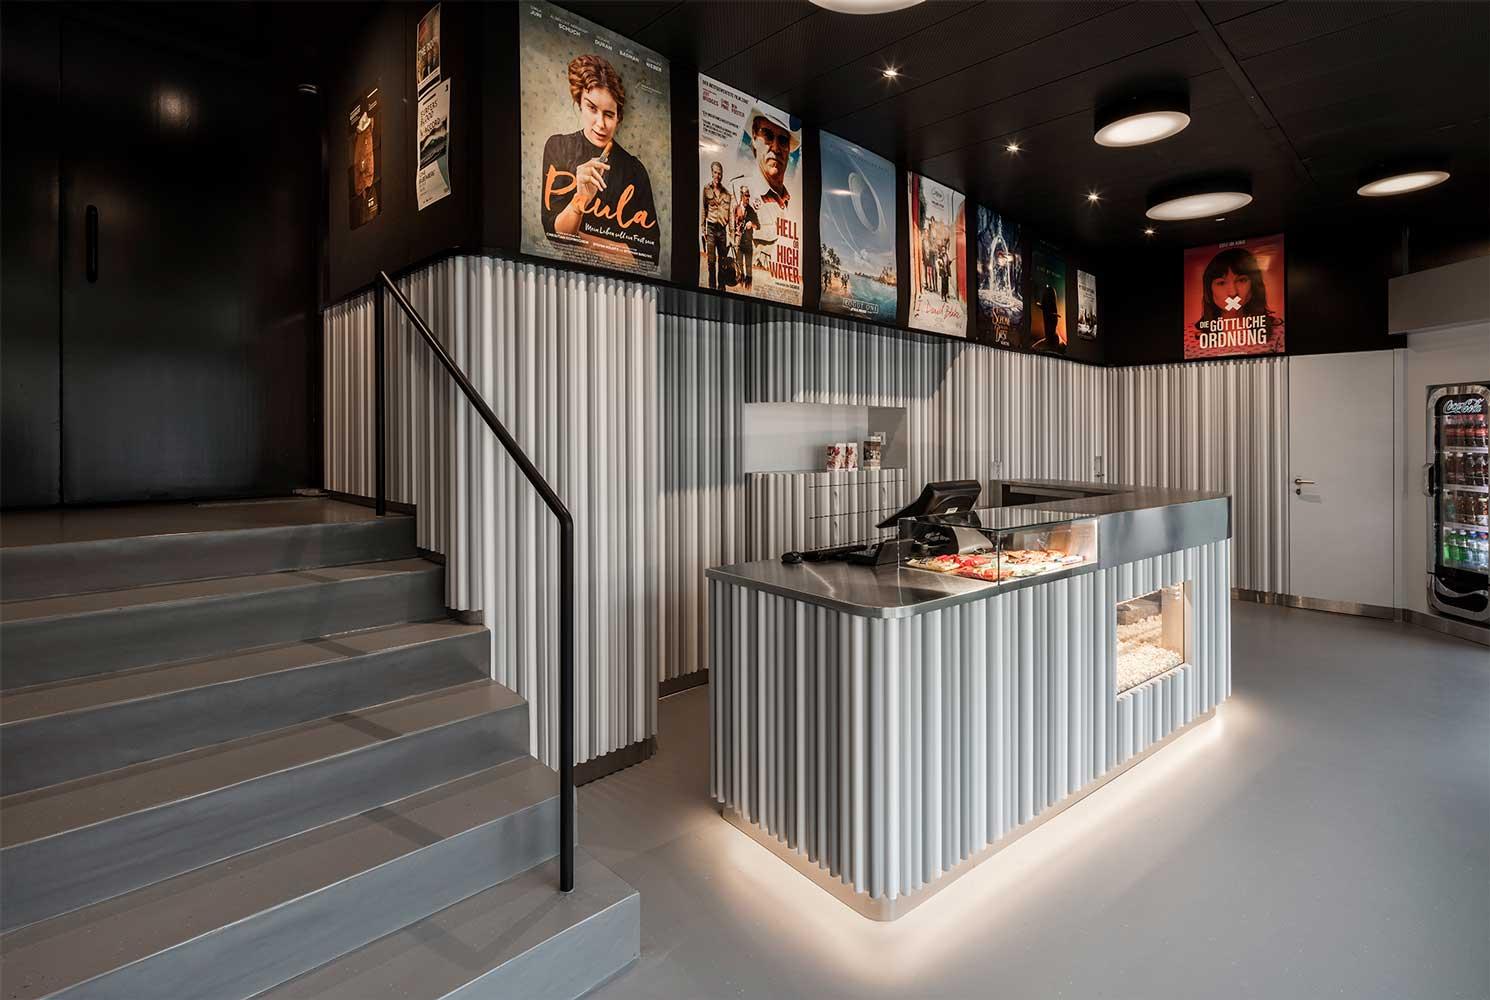 Umbau und Sanierung Foyer Kino Camera Bern